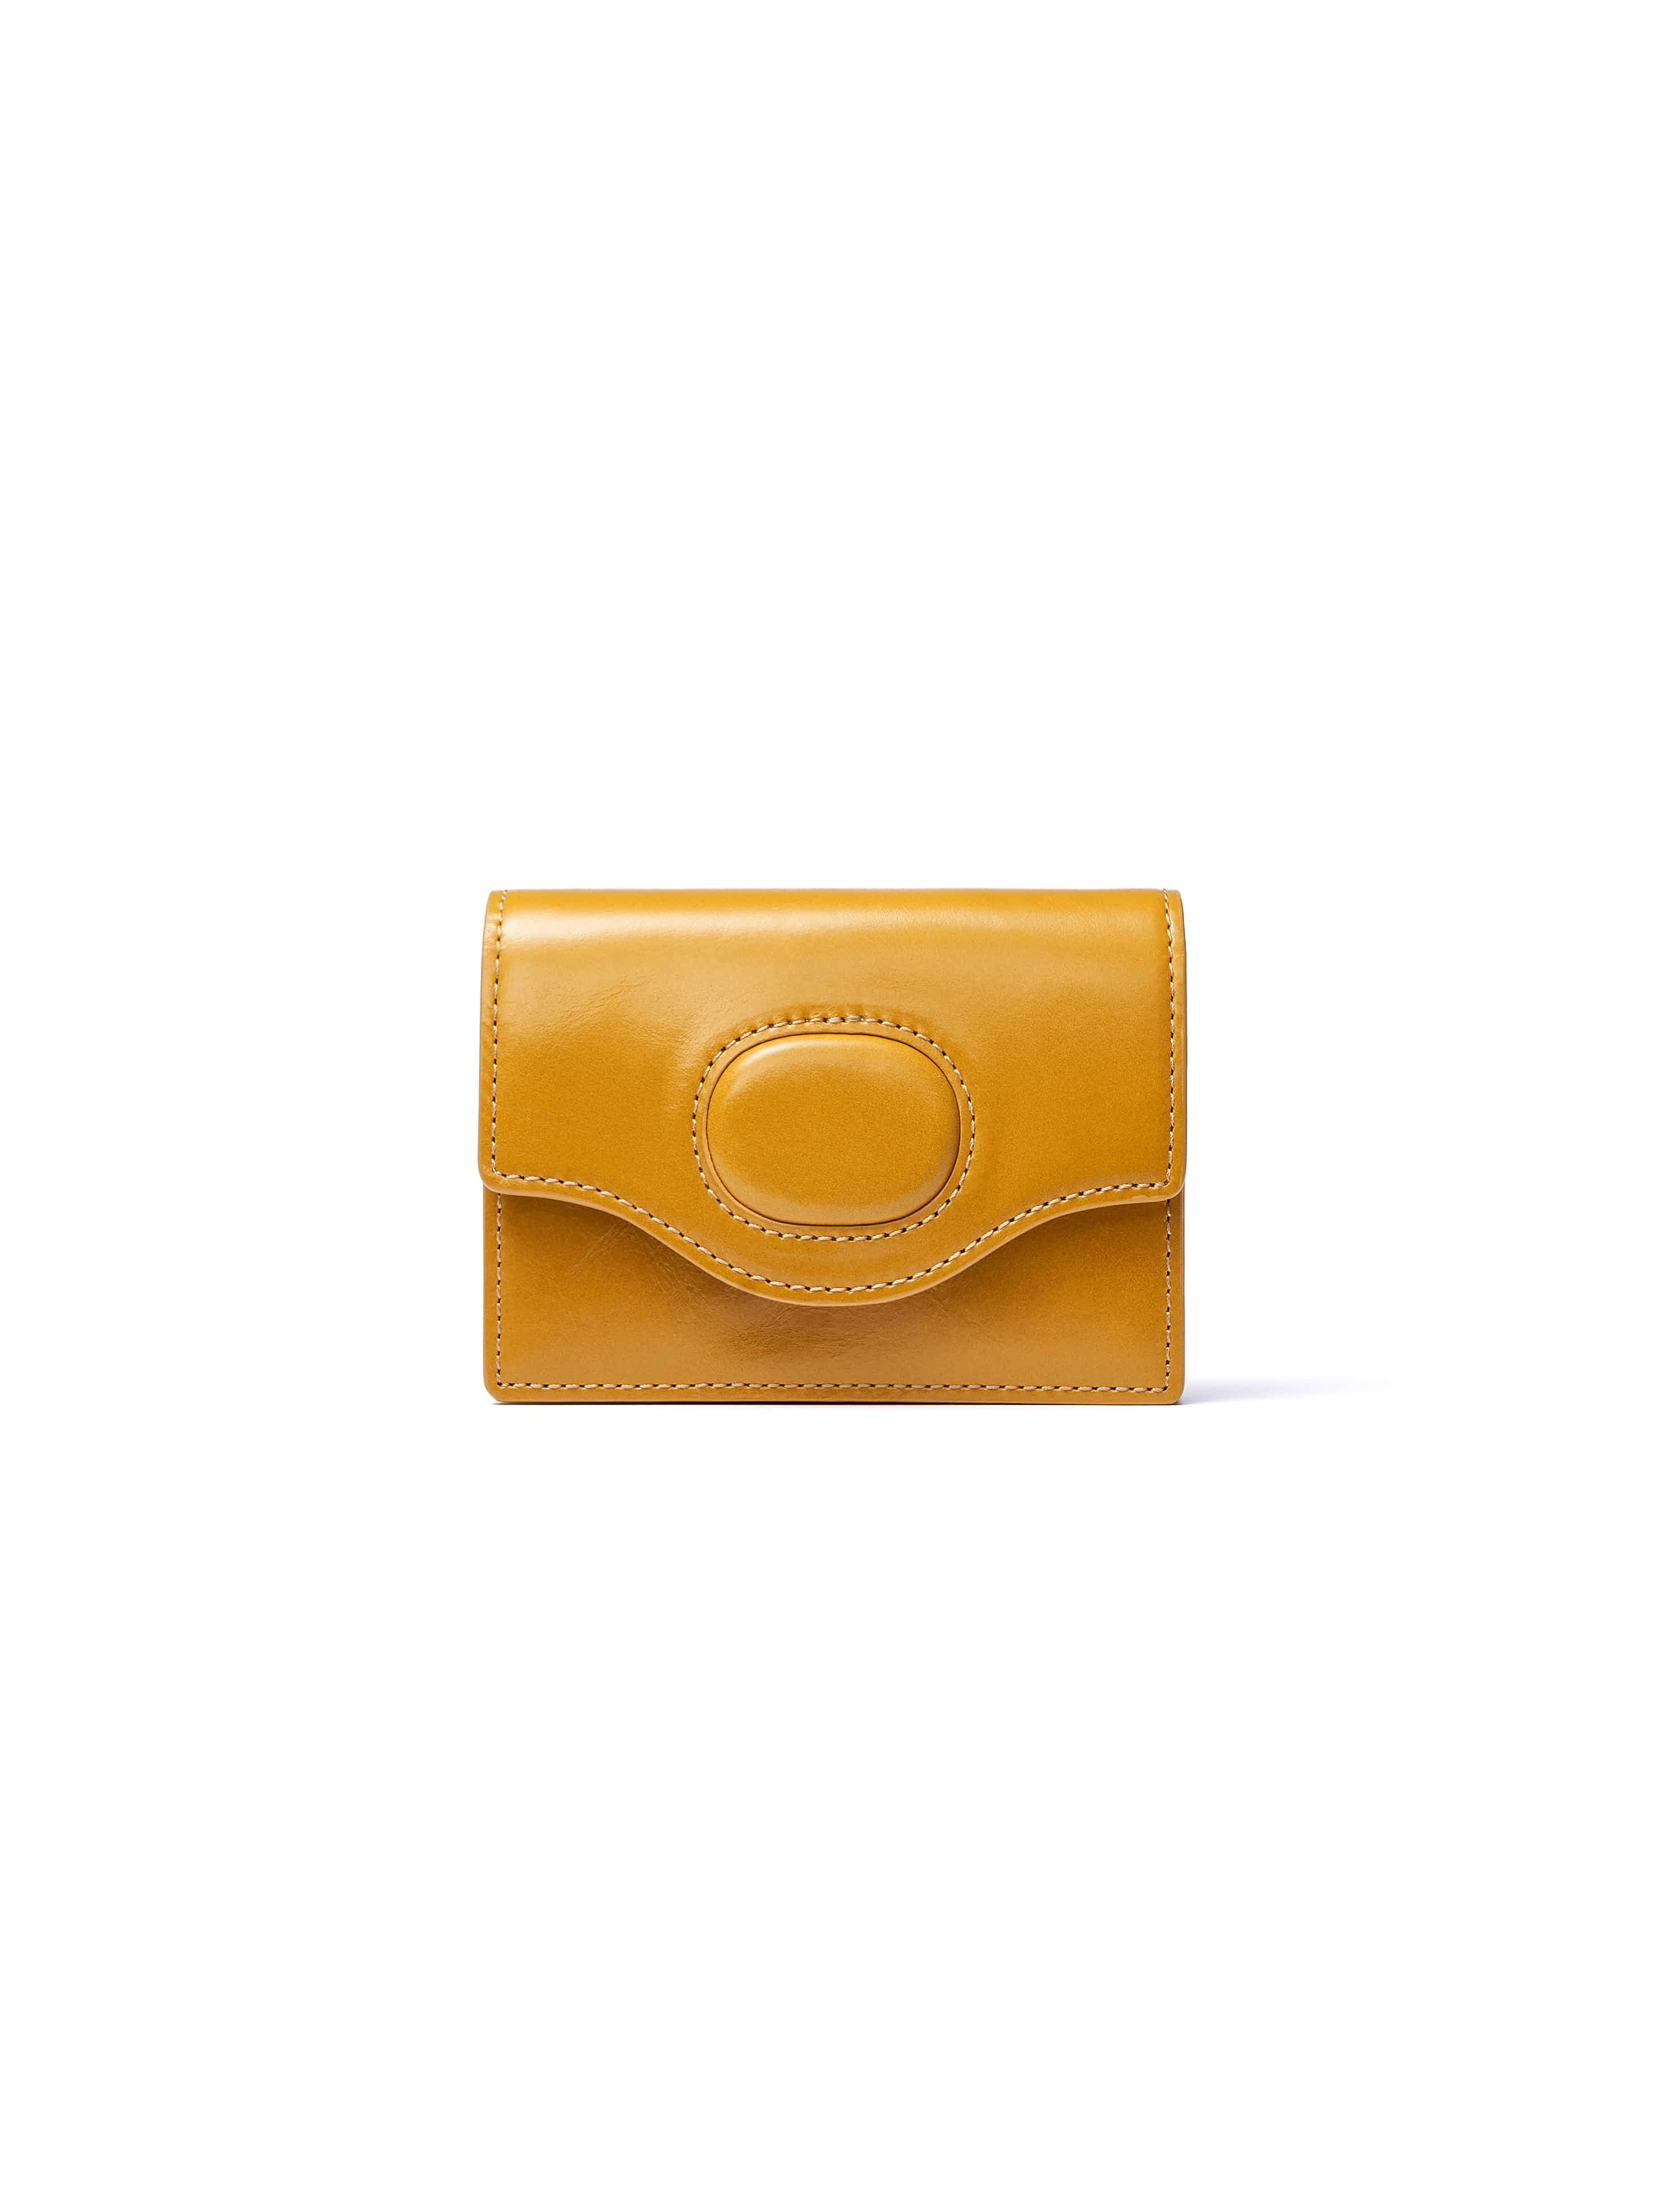 [NEW SEASON] EGGSHELL CARD WALLET_MUSTARD [9/16일 순차배송]